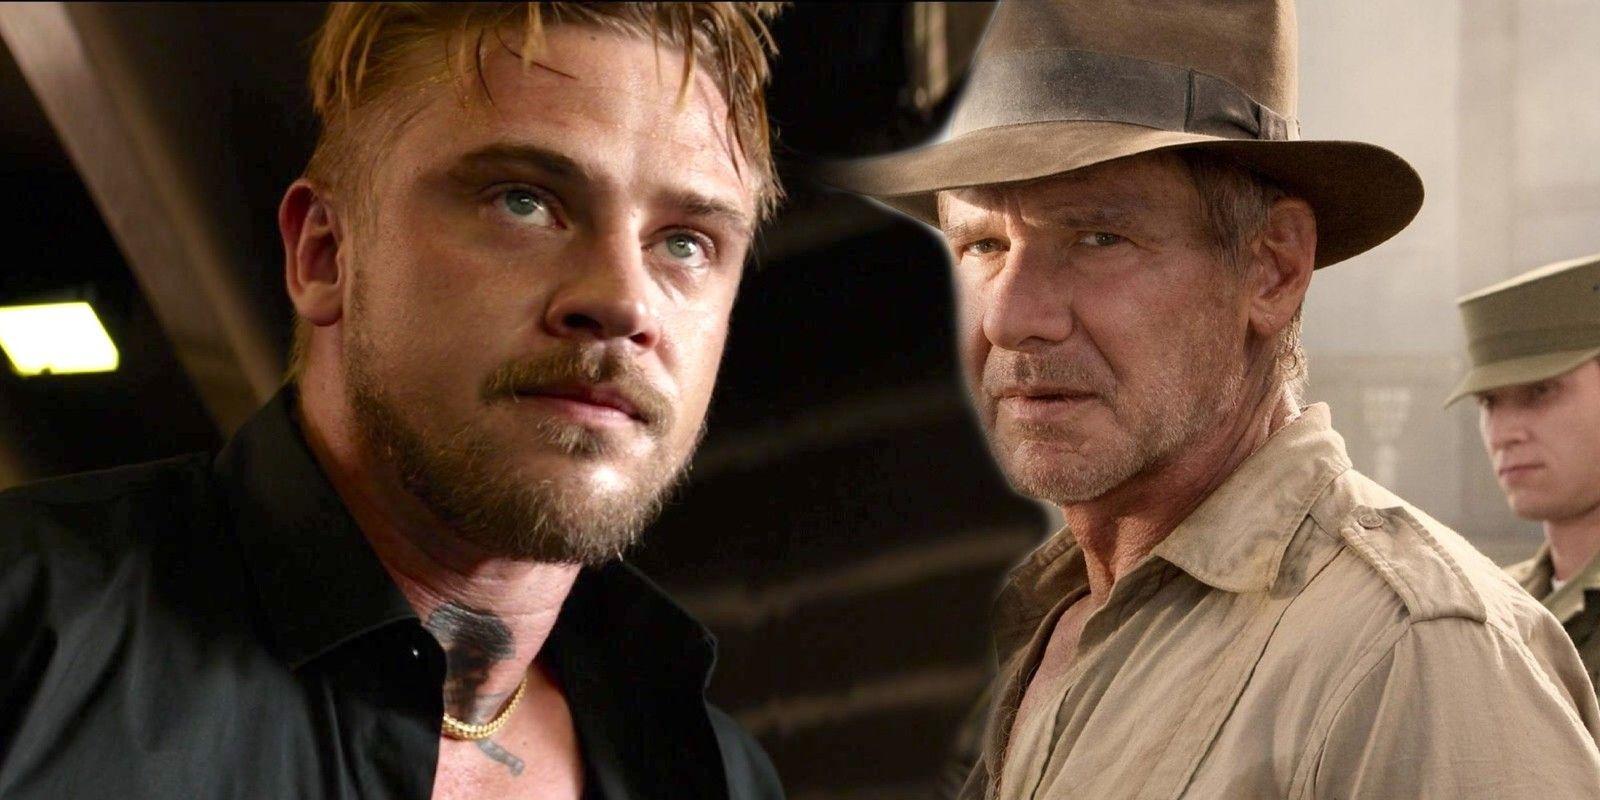 Indiana Jones 5 Set Photos Reveal Boyd Holbrook's Costume